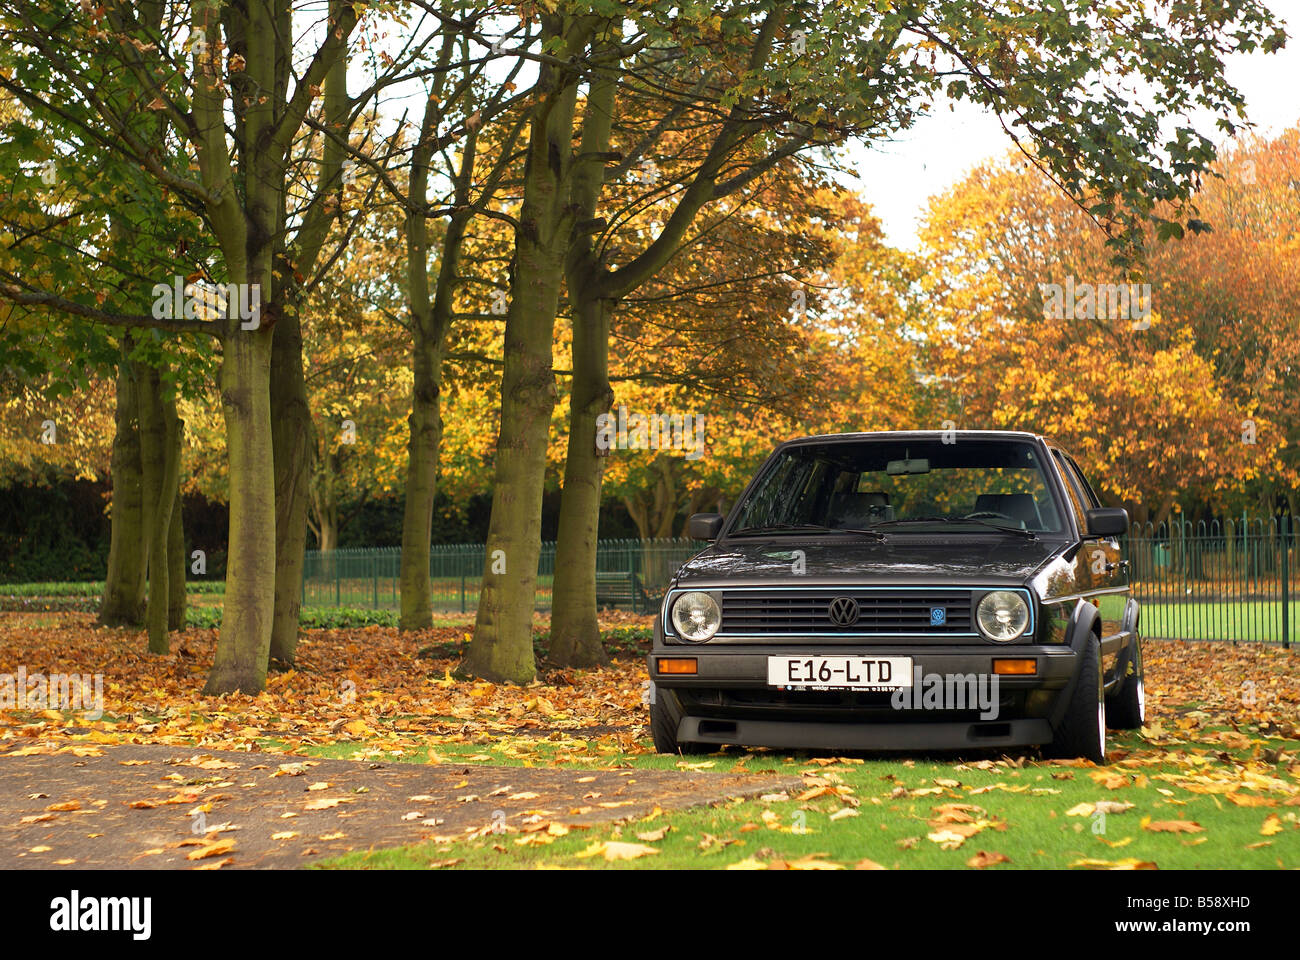 VW Golf MKII G60 16v Limited - Stock Image